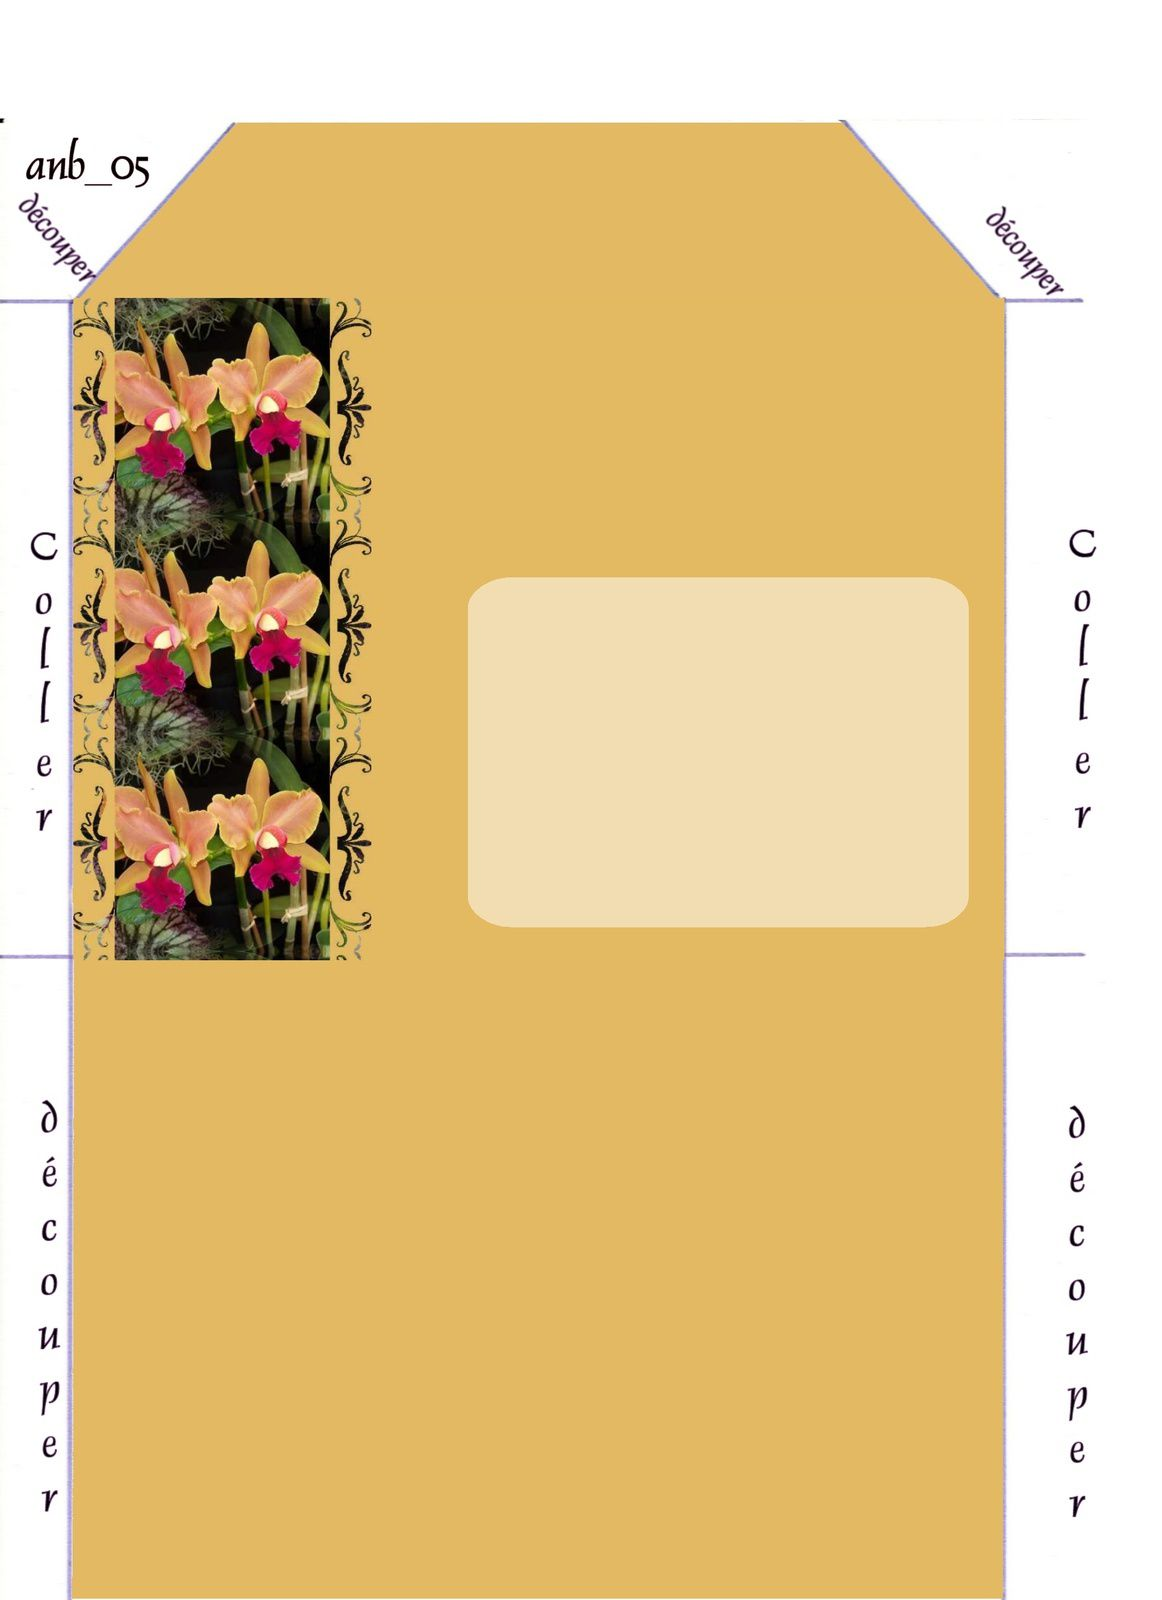 Orchidee Incredimail &amp&#x3B; Papier A4 h l &amp&#x3B; outlook &amp&#x3B; enveloppe &amp&#x3B; 2 cartes A5 &amp&#x3B; signets 3 langues   100_2434